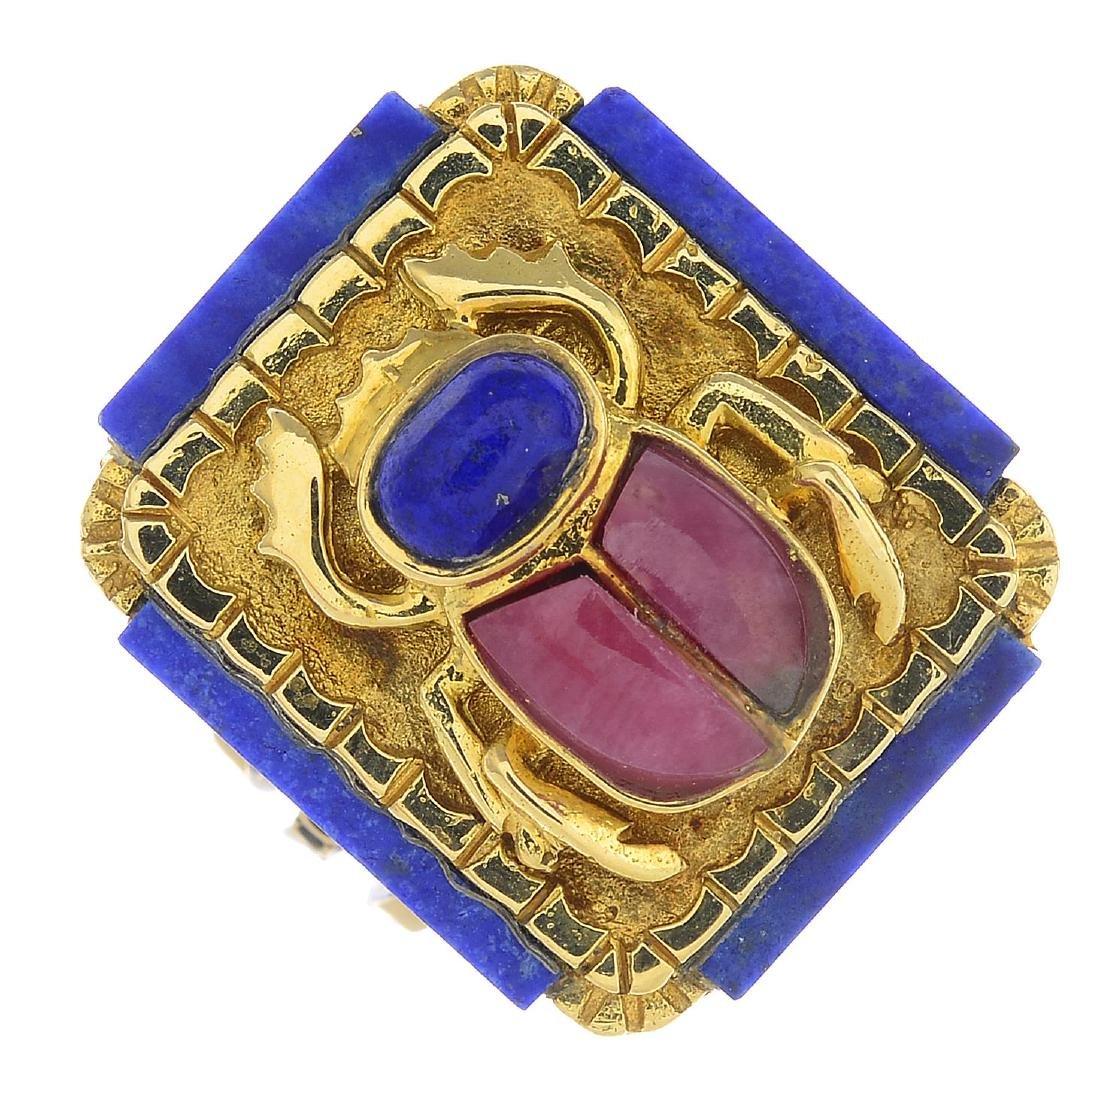 A lapis lazuli and rhodochrosite dress ring. Designed